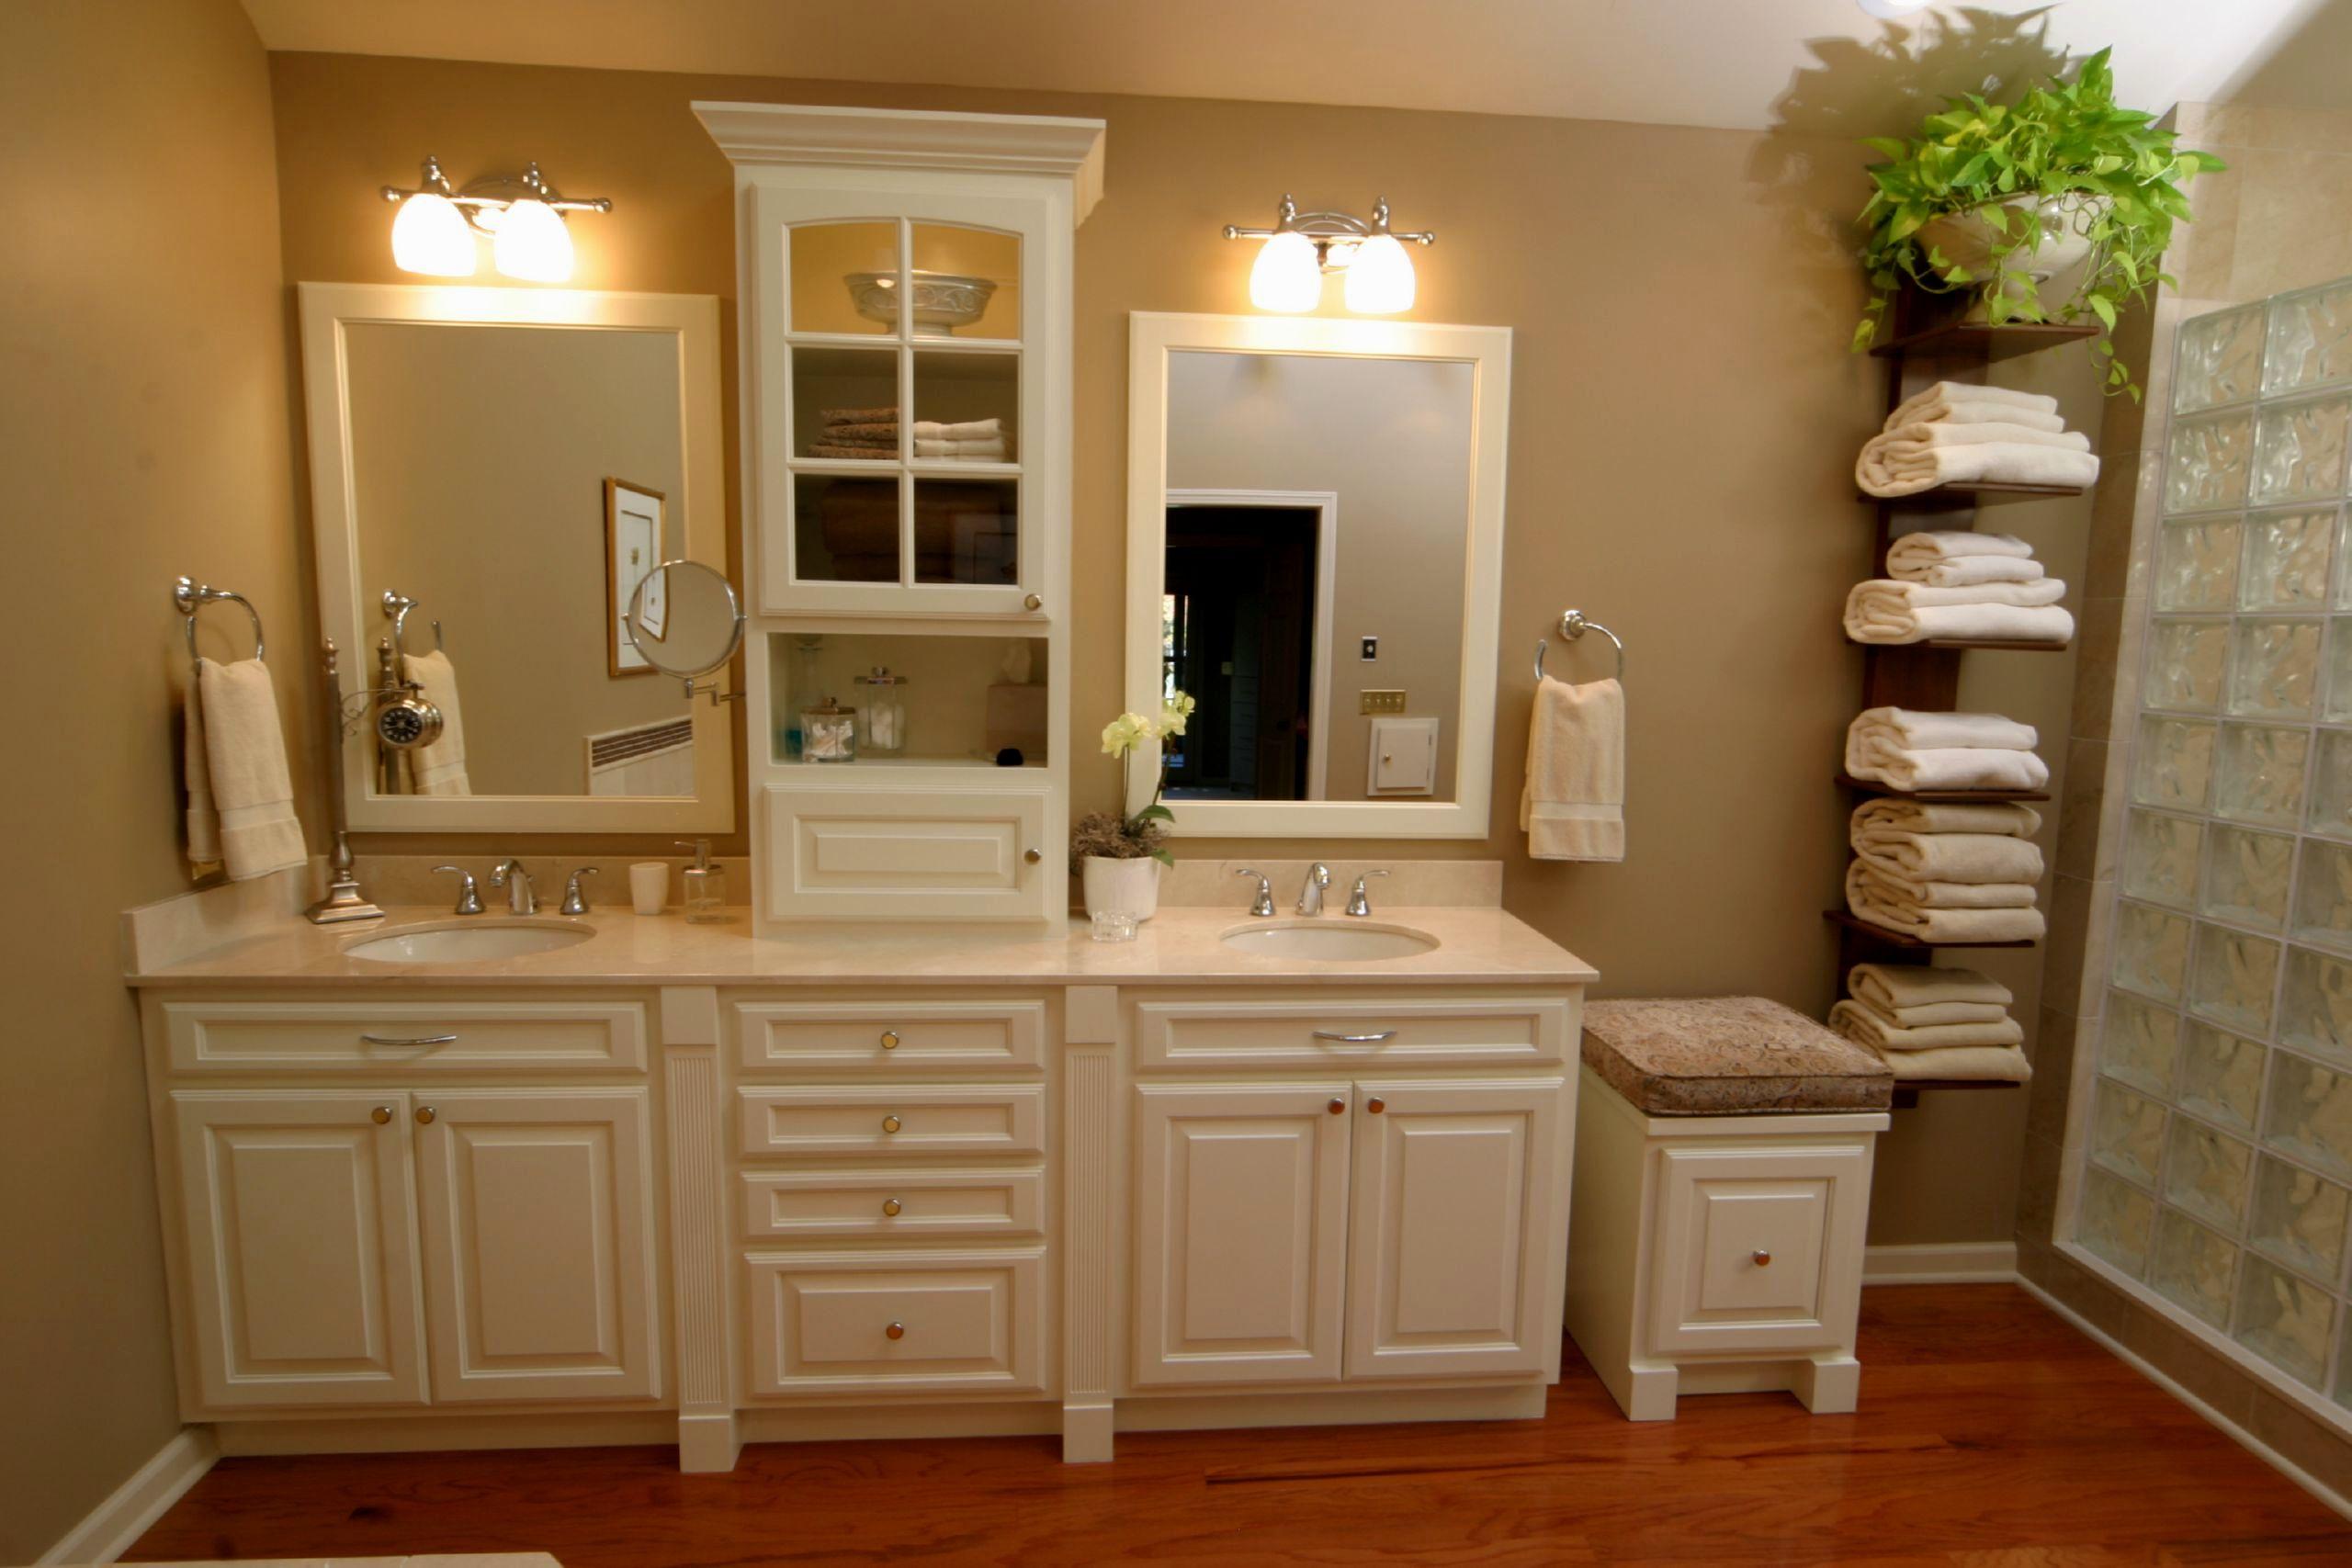 modern hardwood floors in bathroom inspiration-Contemporary Hardwood Floors In Bathroom Photo